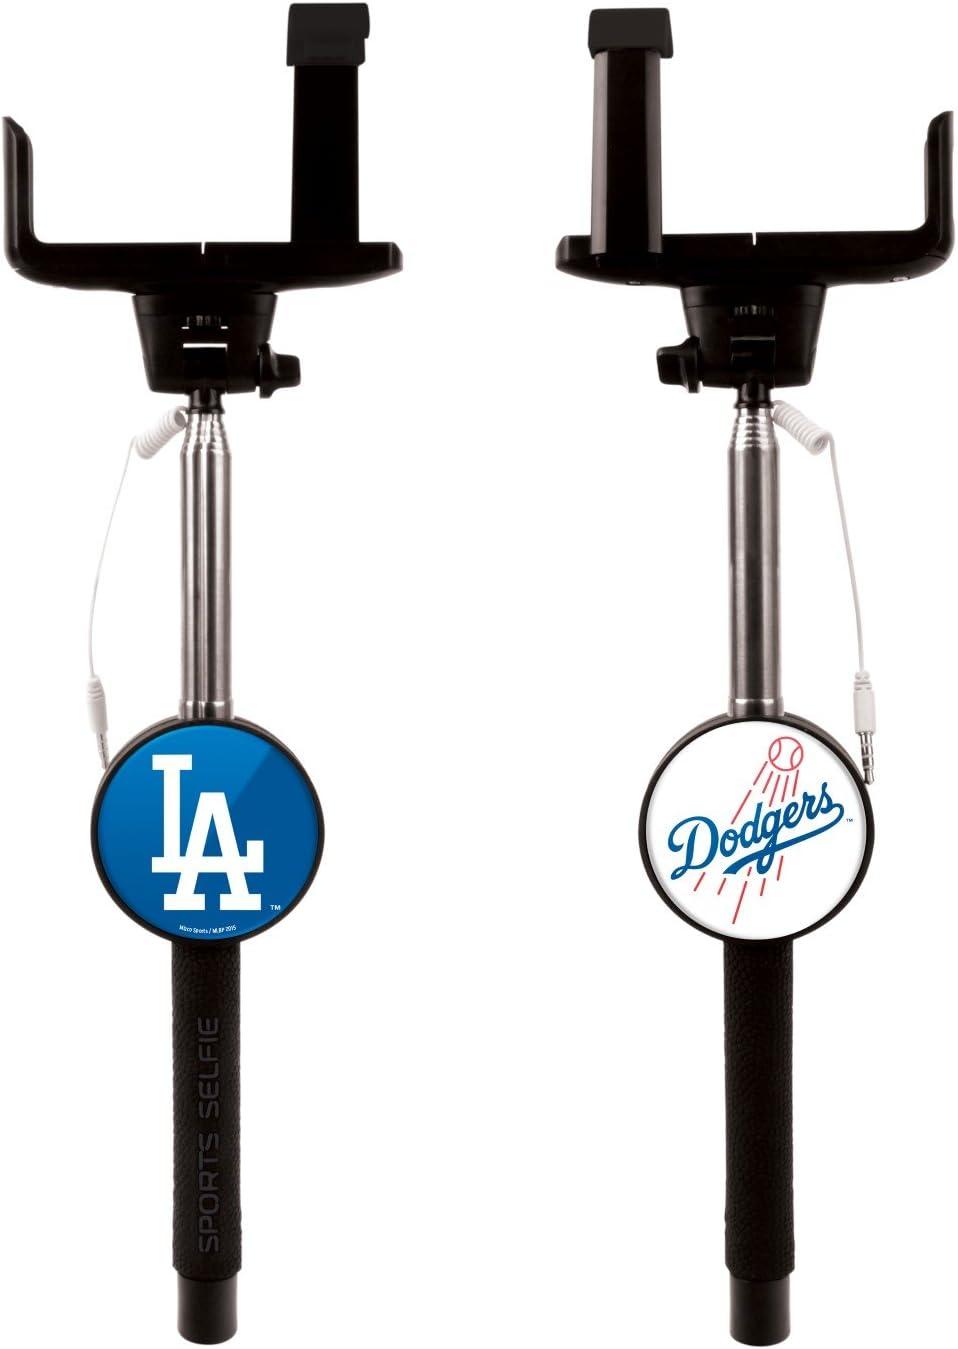 MLB Los Angeles Dodgers Overseas parallel Very popular import regular item Sports Selfie Stick